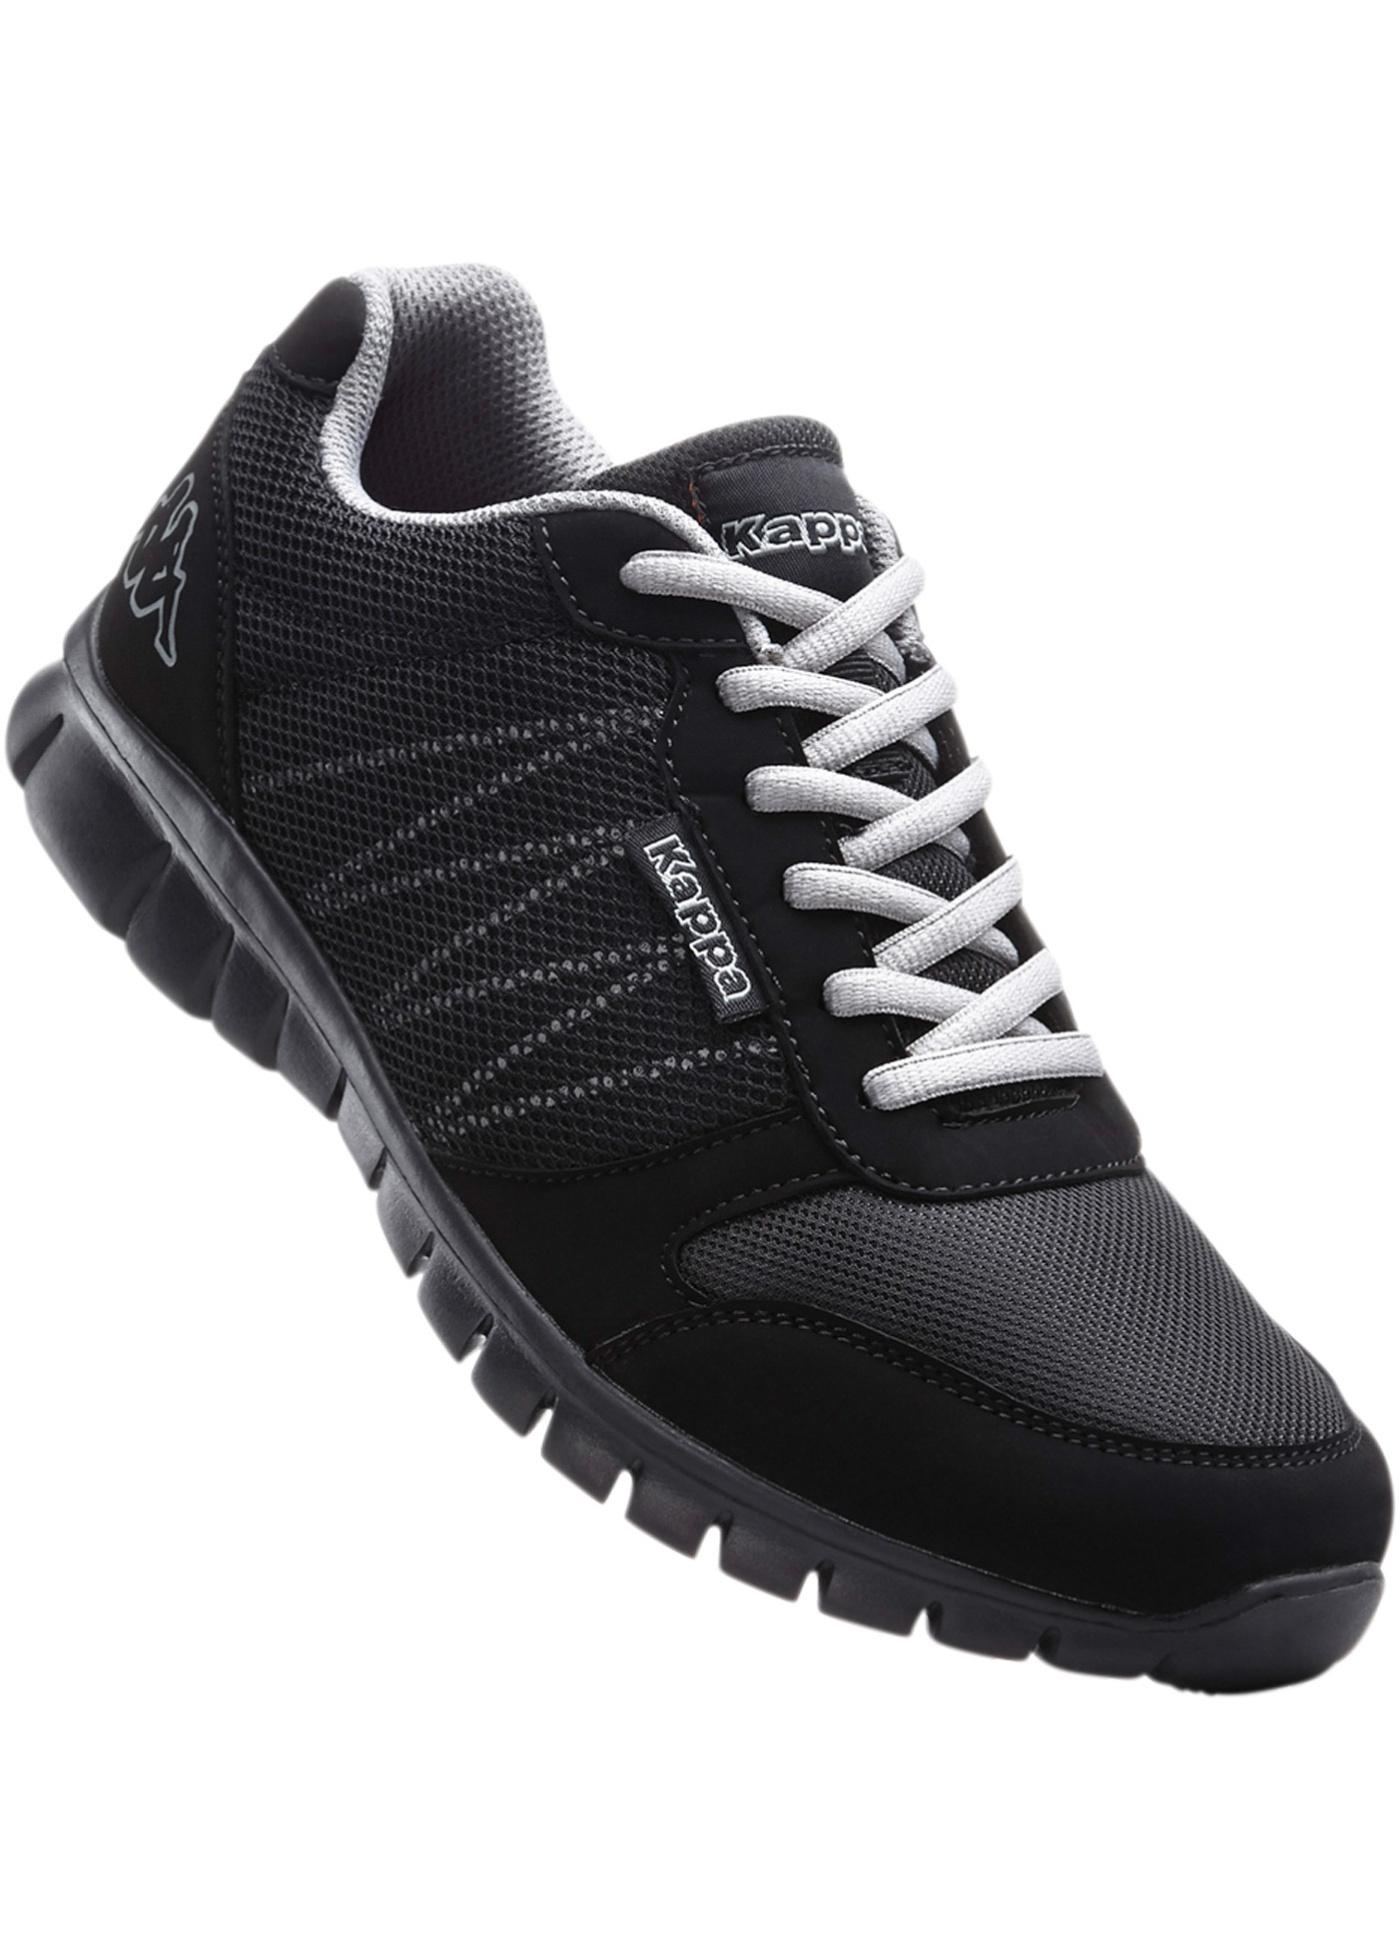 Chaussures de sport de Kappa